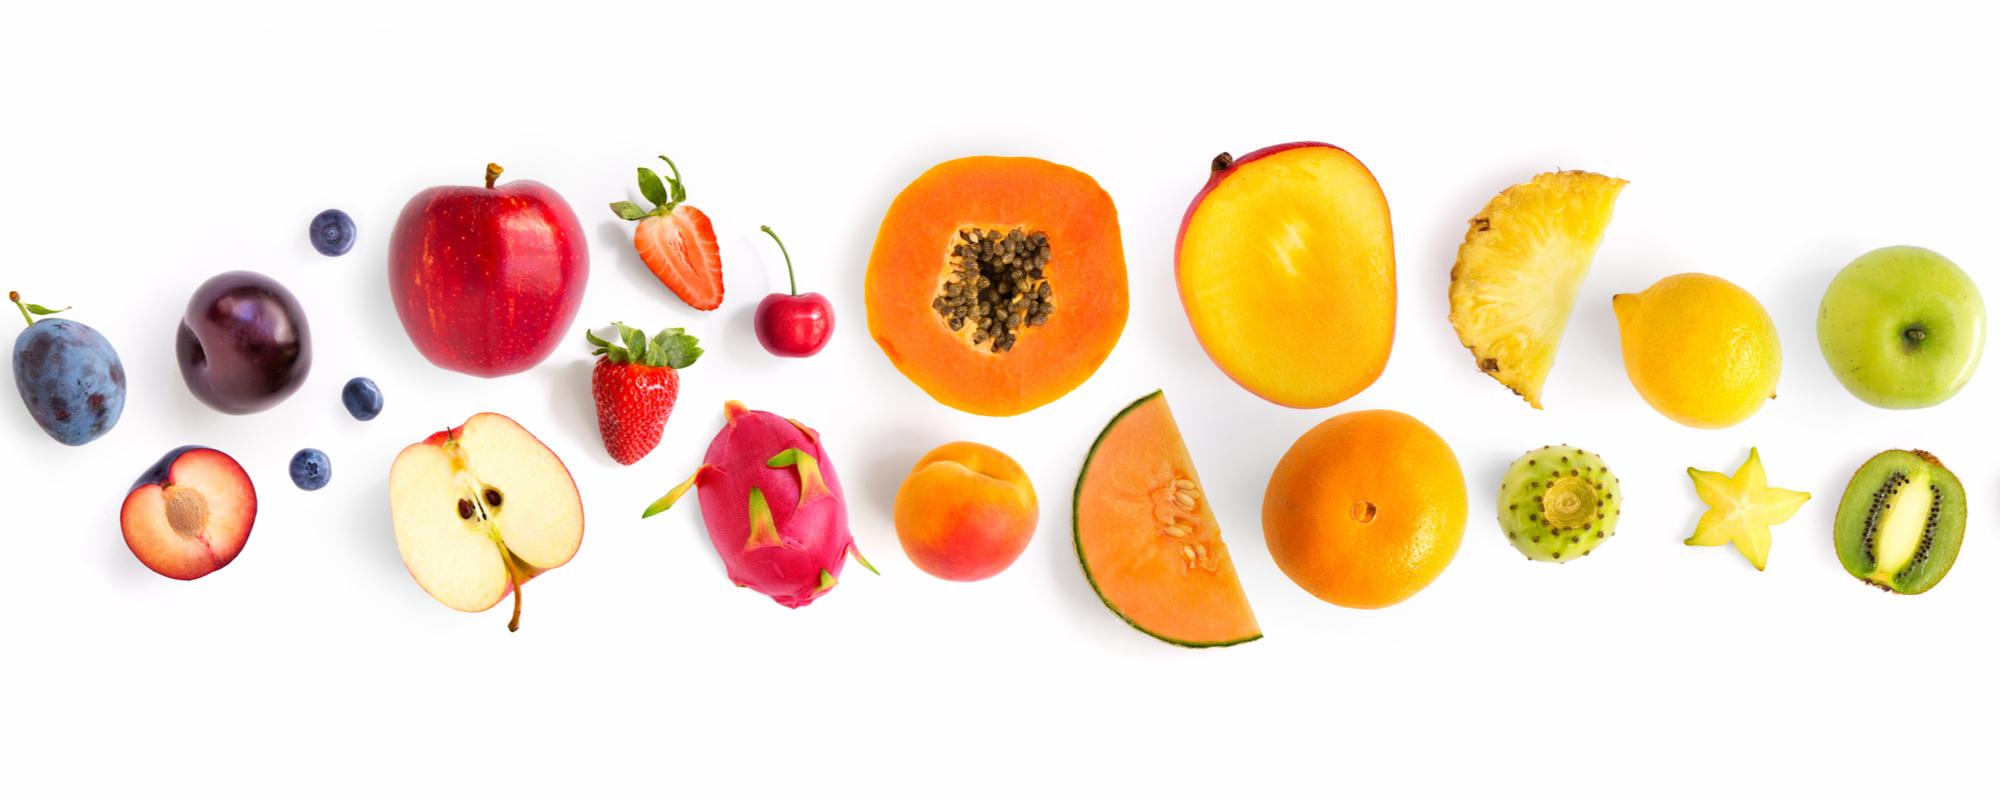 frutta esotica fruktosa